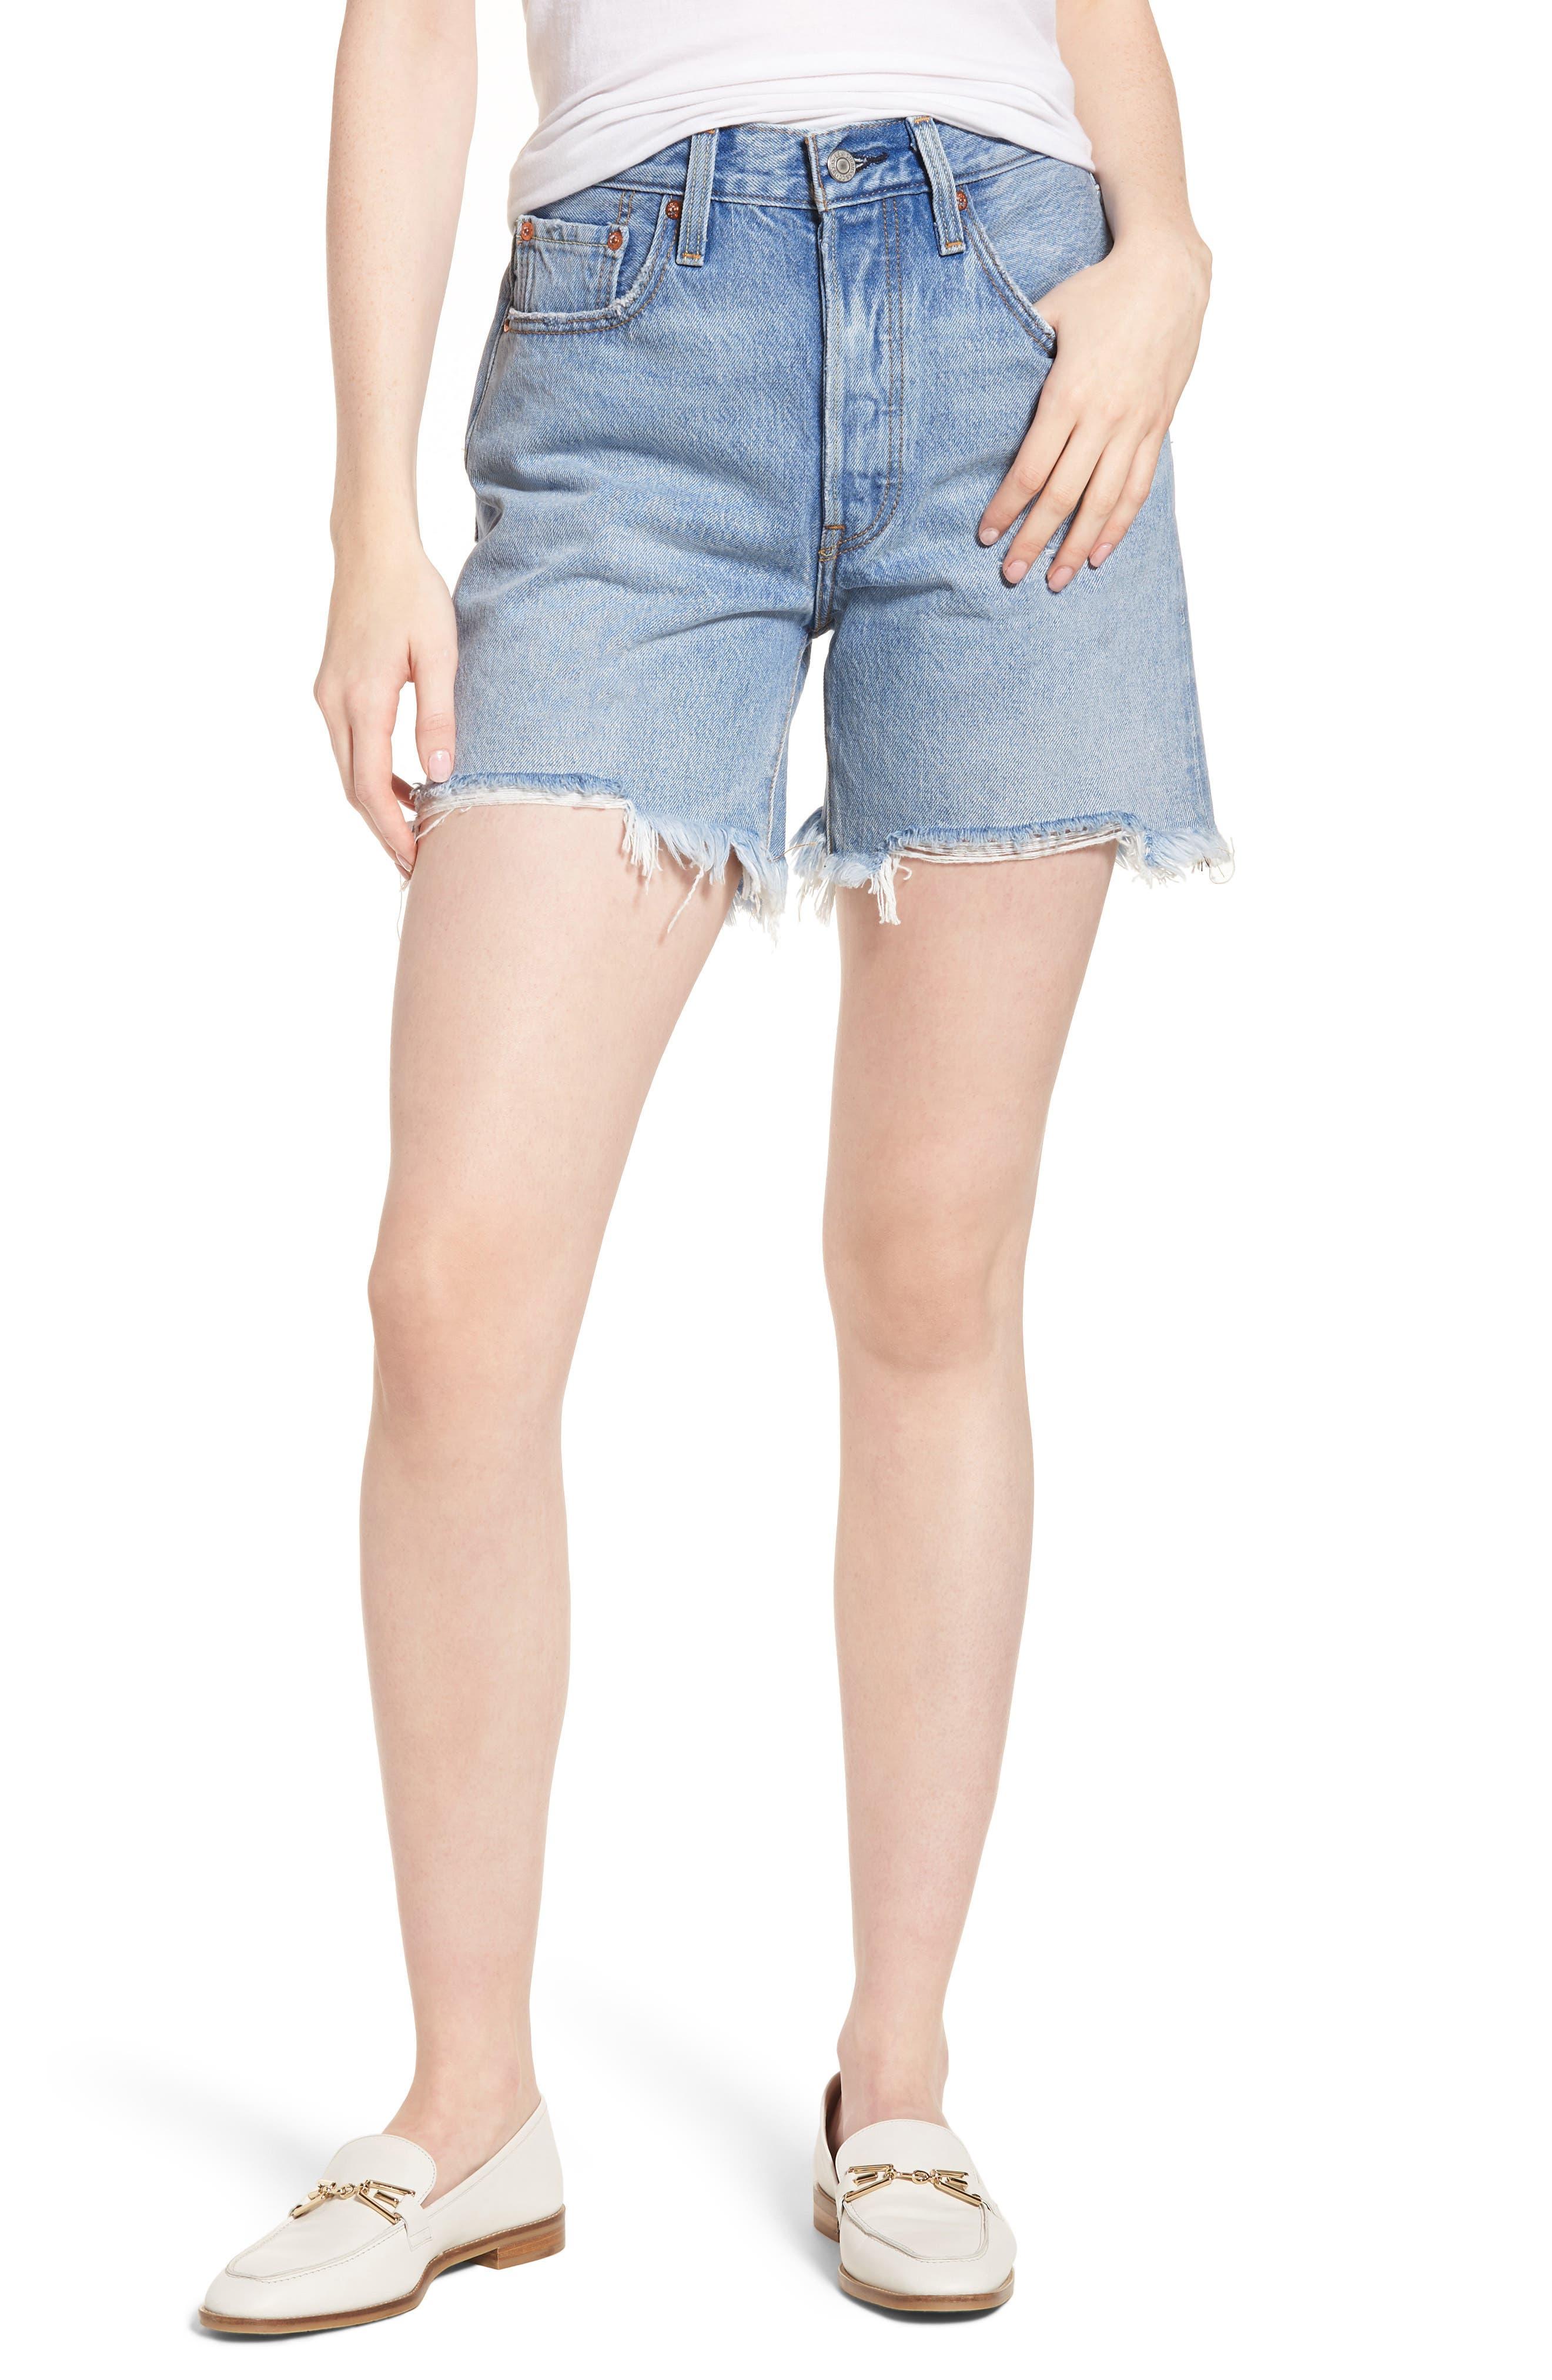 Indie Shredded Shorts,                             Main thumbnail 1, color,                             420